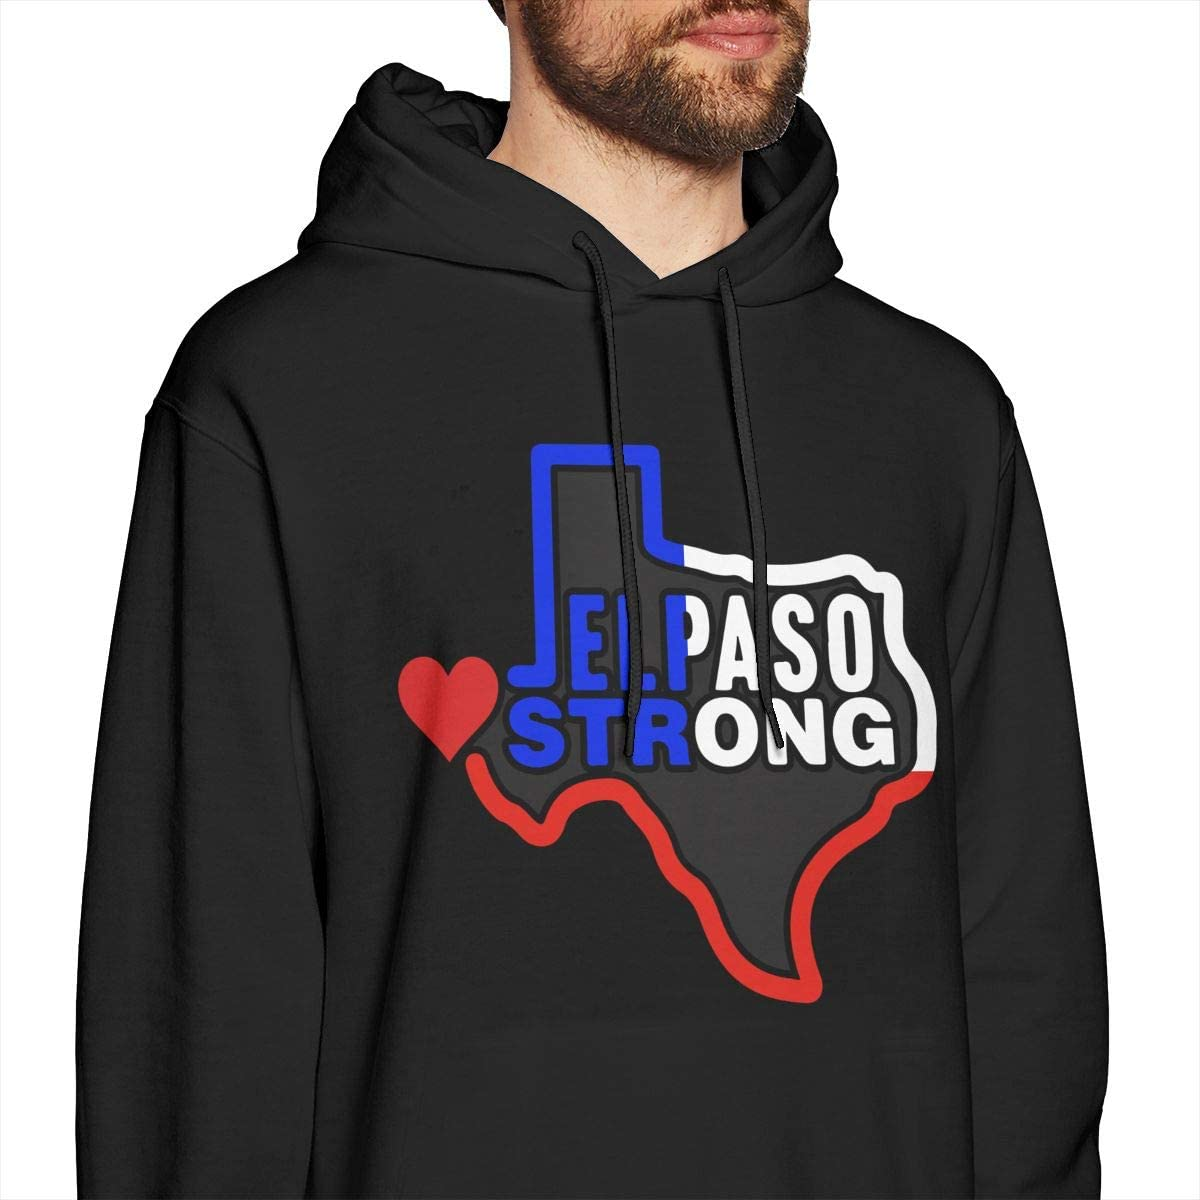 MUSICOT El Paso Strong Mens Pullover Hooded Sweatshirt Cozy Sport Outwear